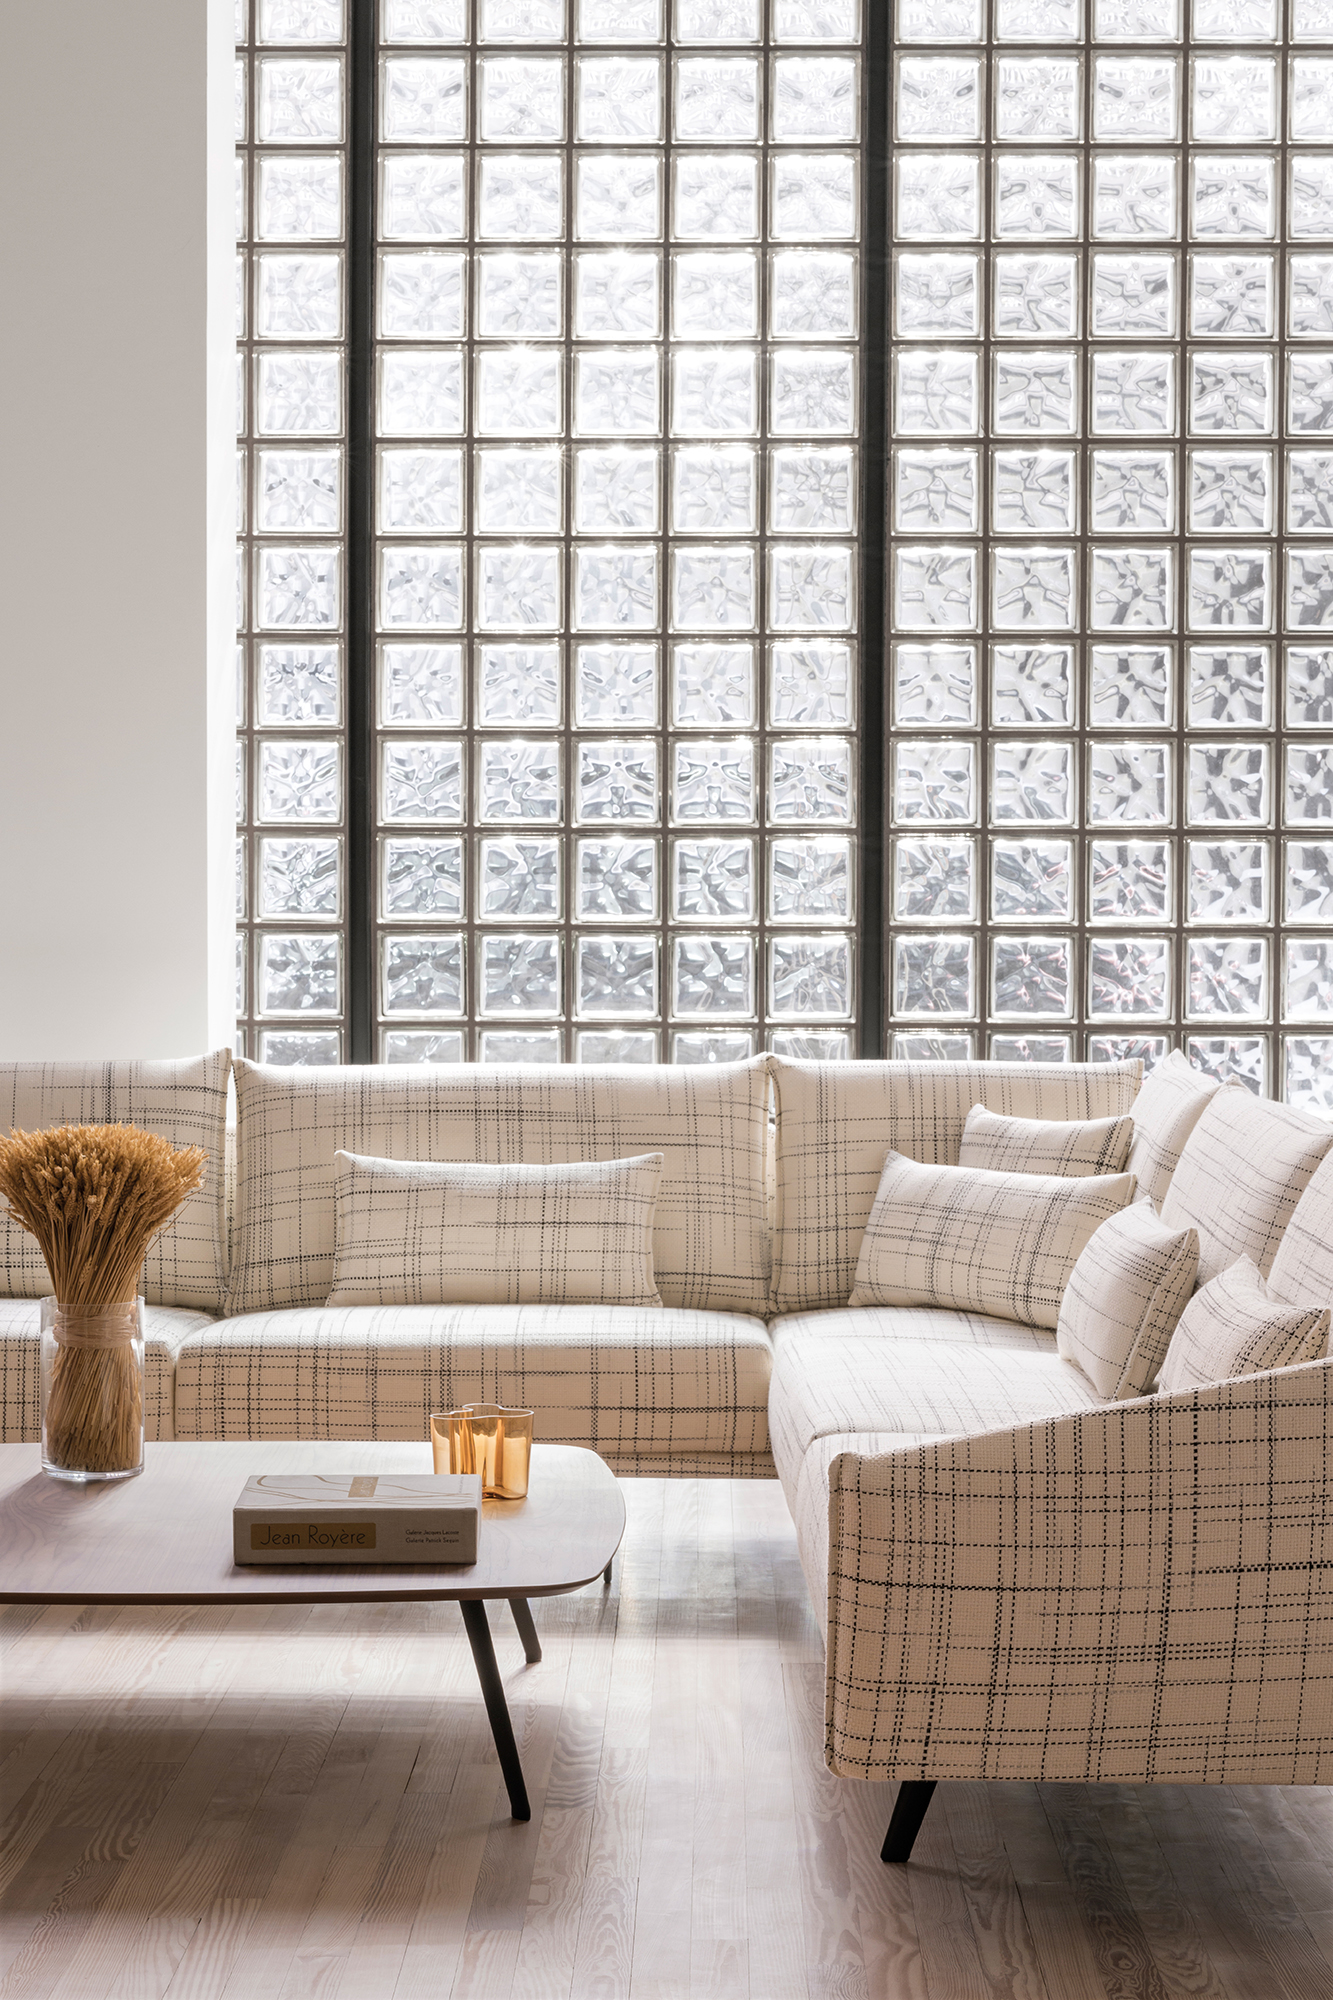 Stua Costura Sofa With Corner In Giulia 201 and Solapa Coffee Table